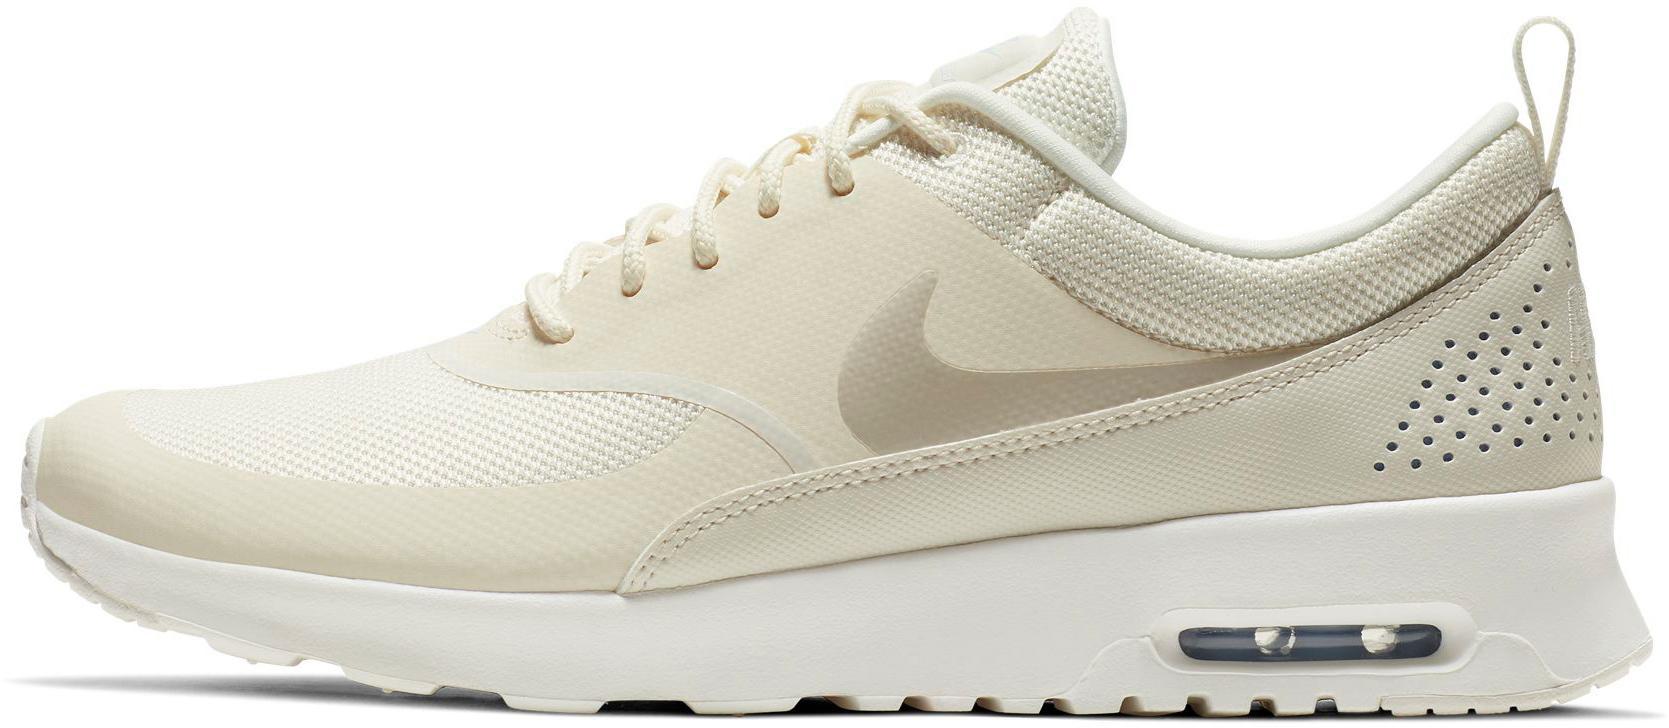 Nike Air Max Thea crimson tintpale ivorycelery (Damen) (599409 805) ab € 79,95